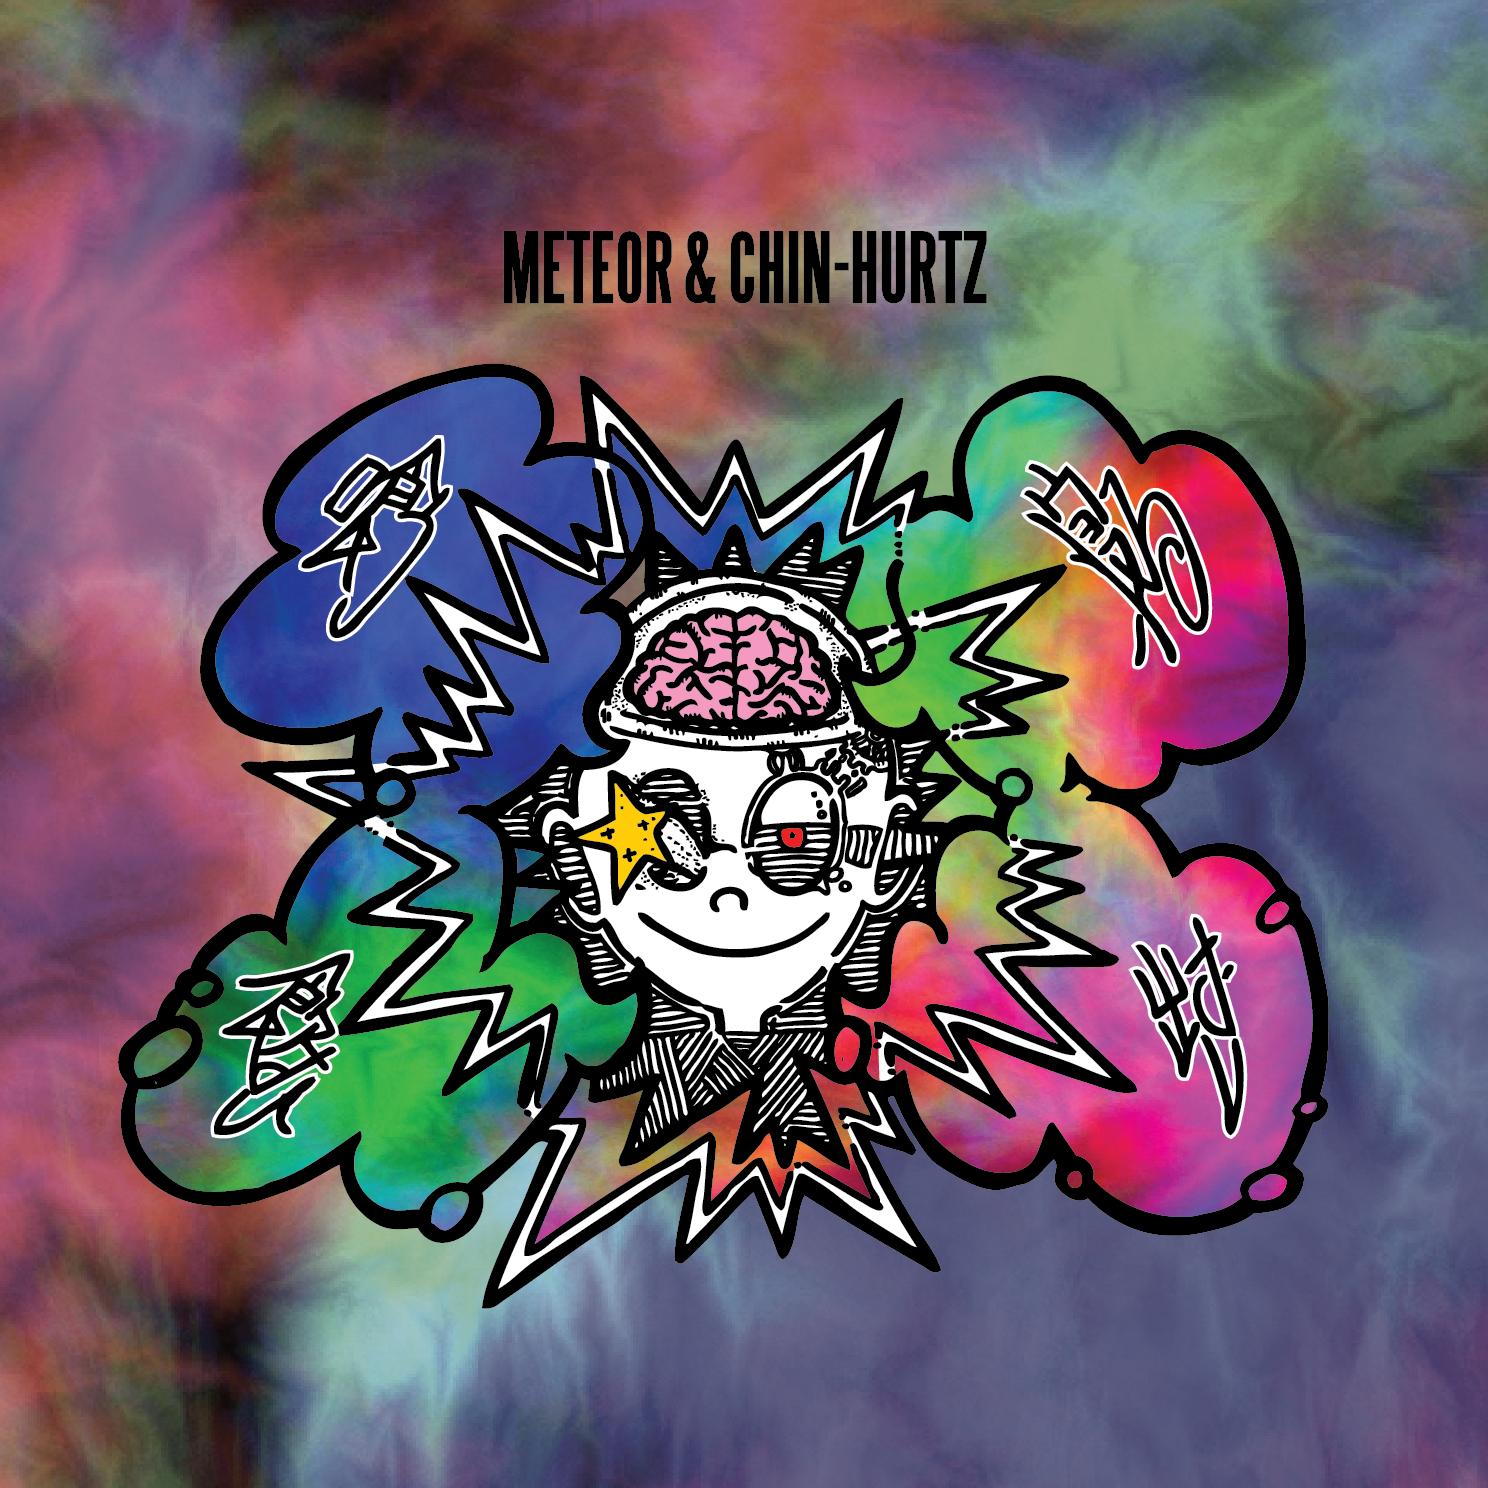 [CD] METEOR&CHIN-HURTZ / 喰う寝る飲む出す